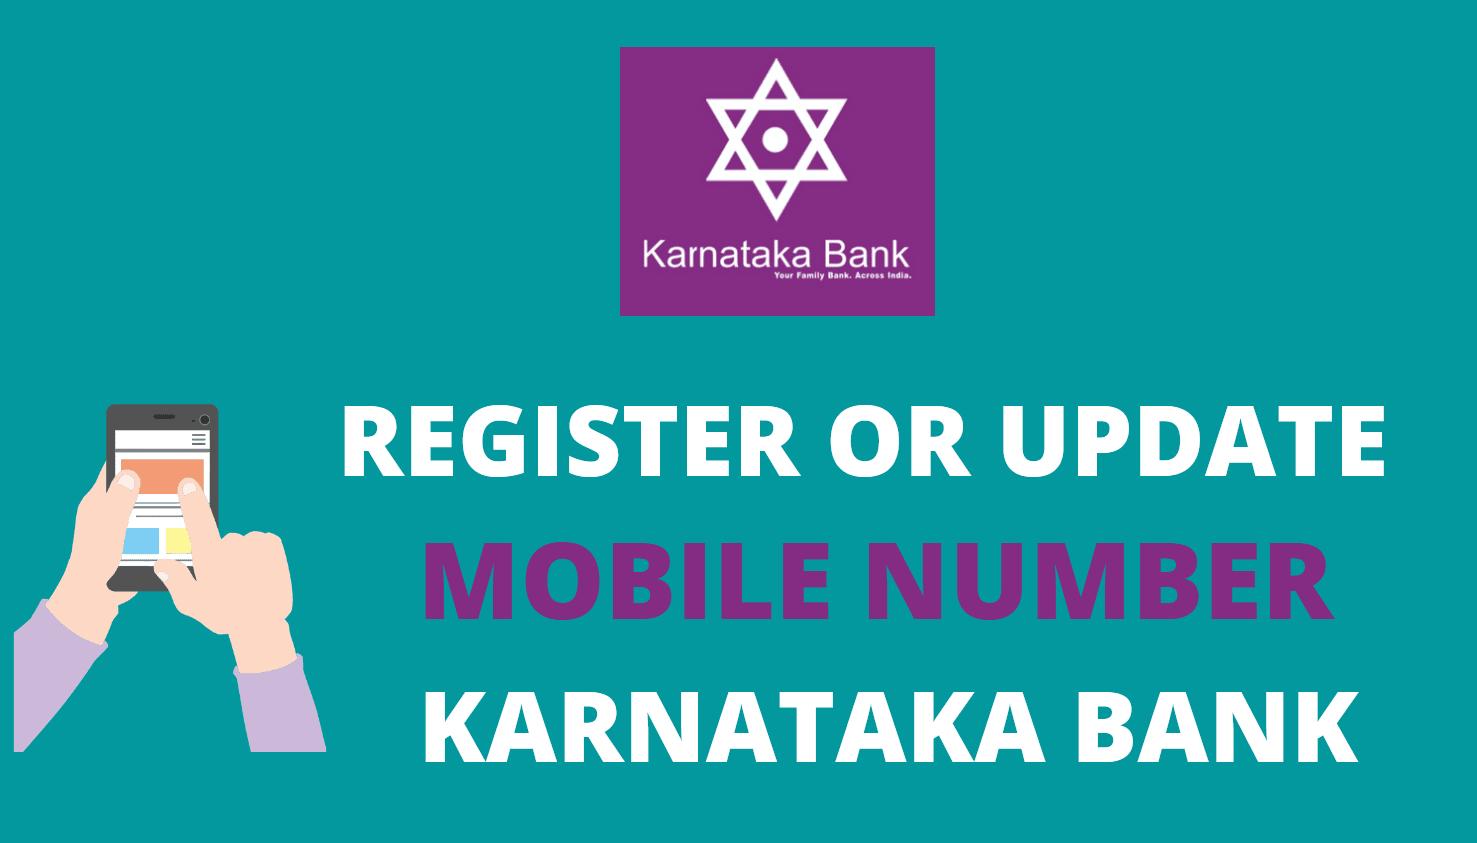 Register or Update Mobile Number in Karnataka Bank